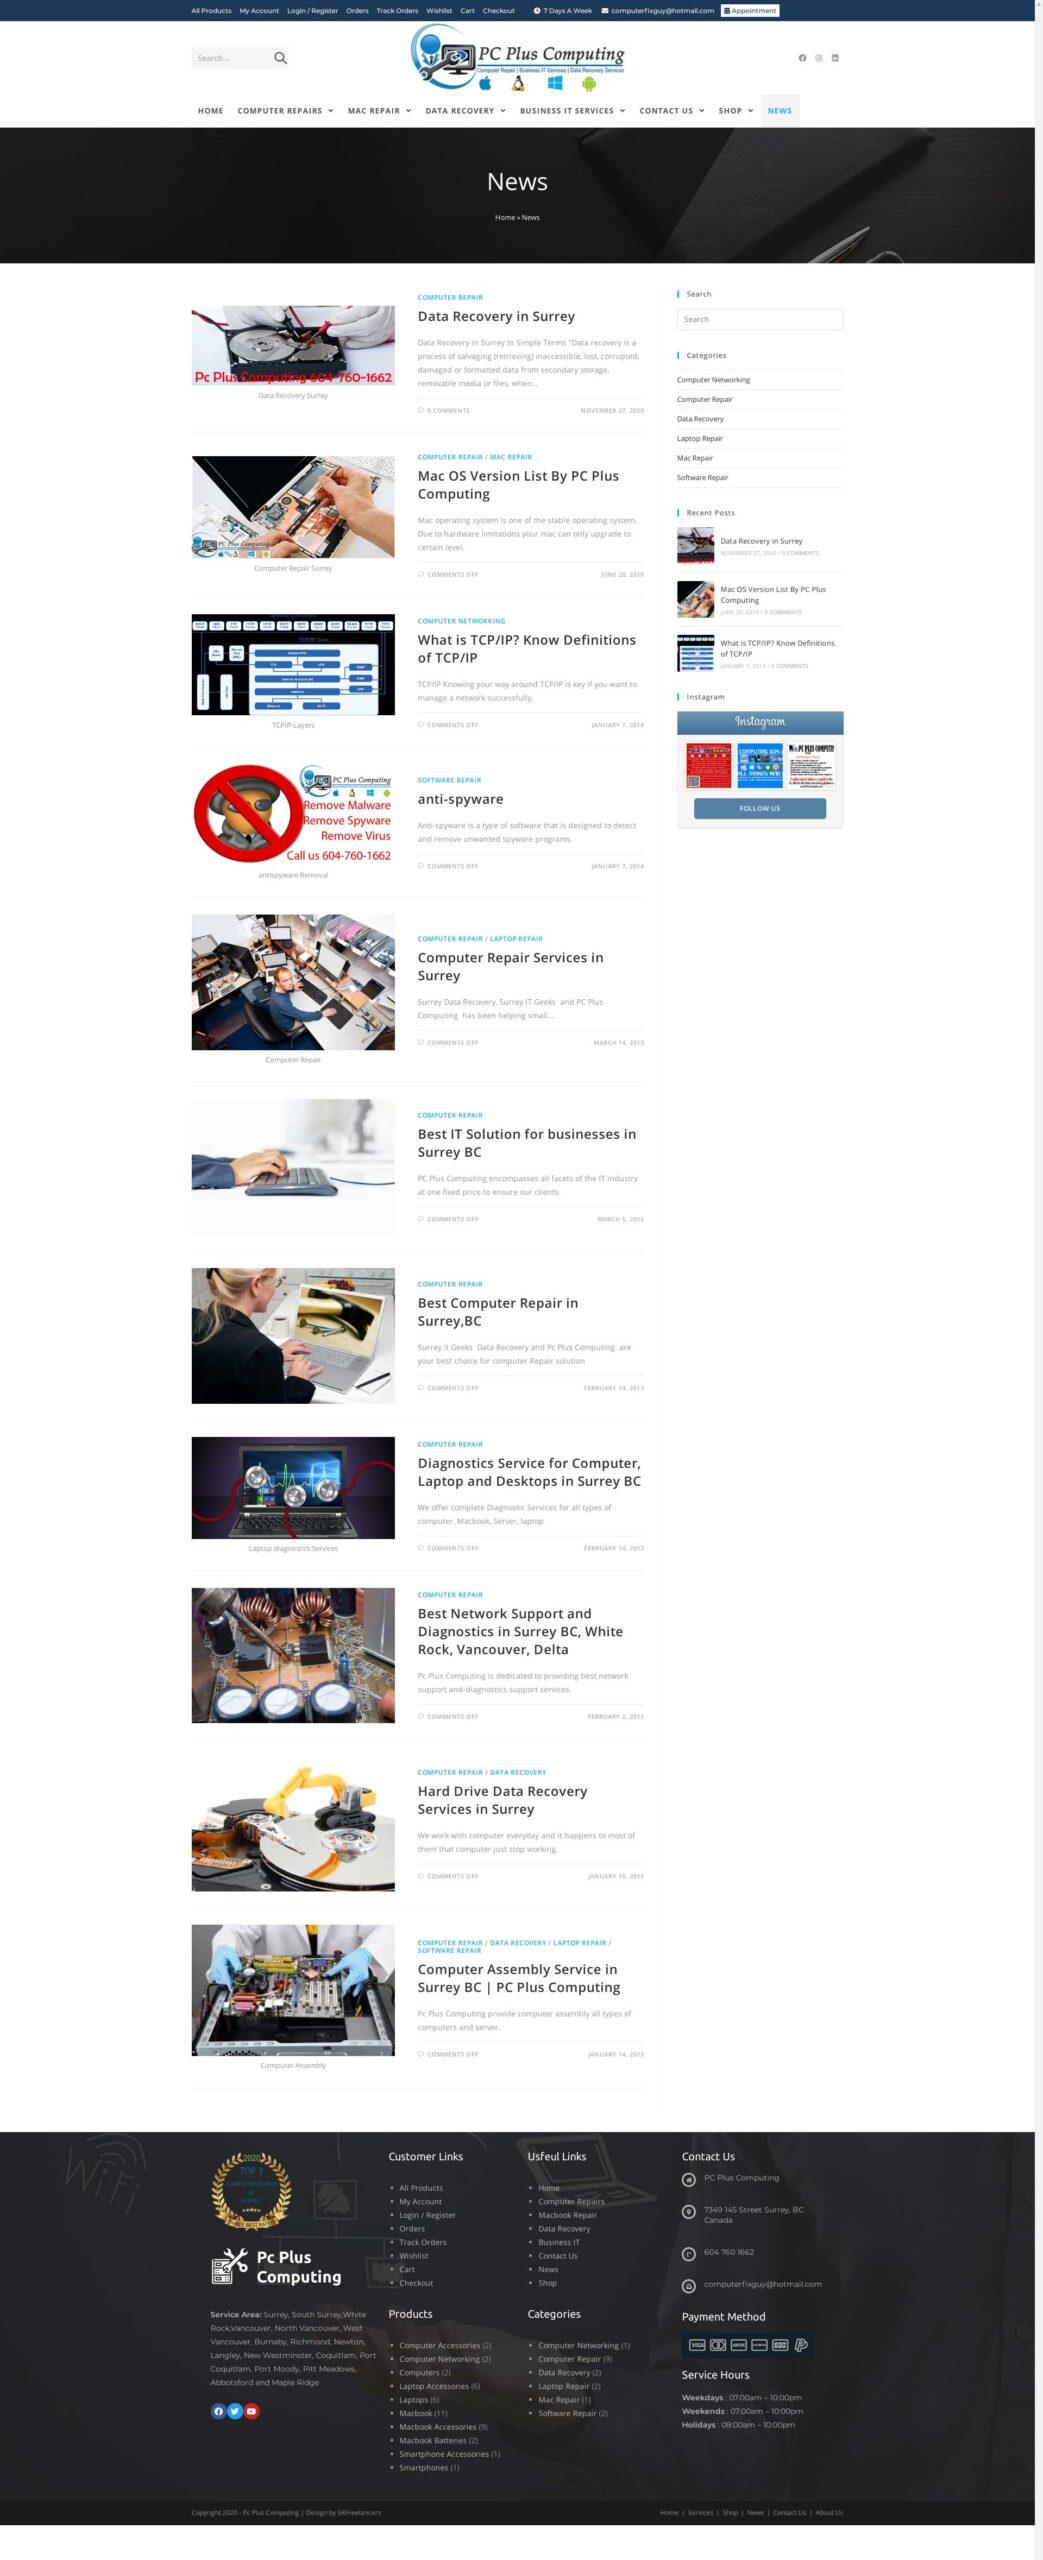 News-Pc-Plus-Computing